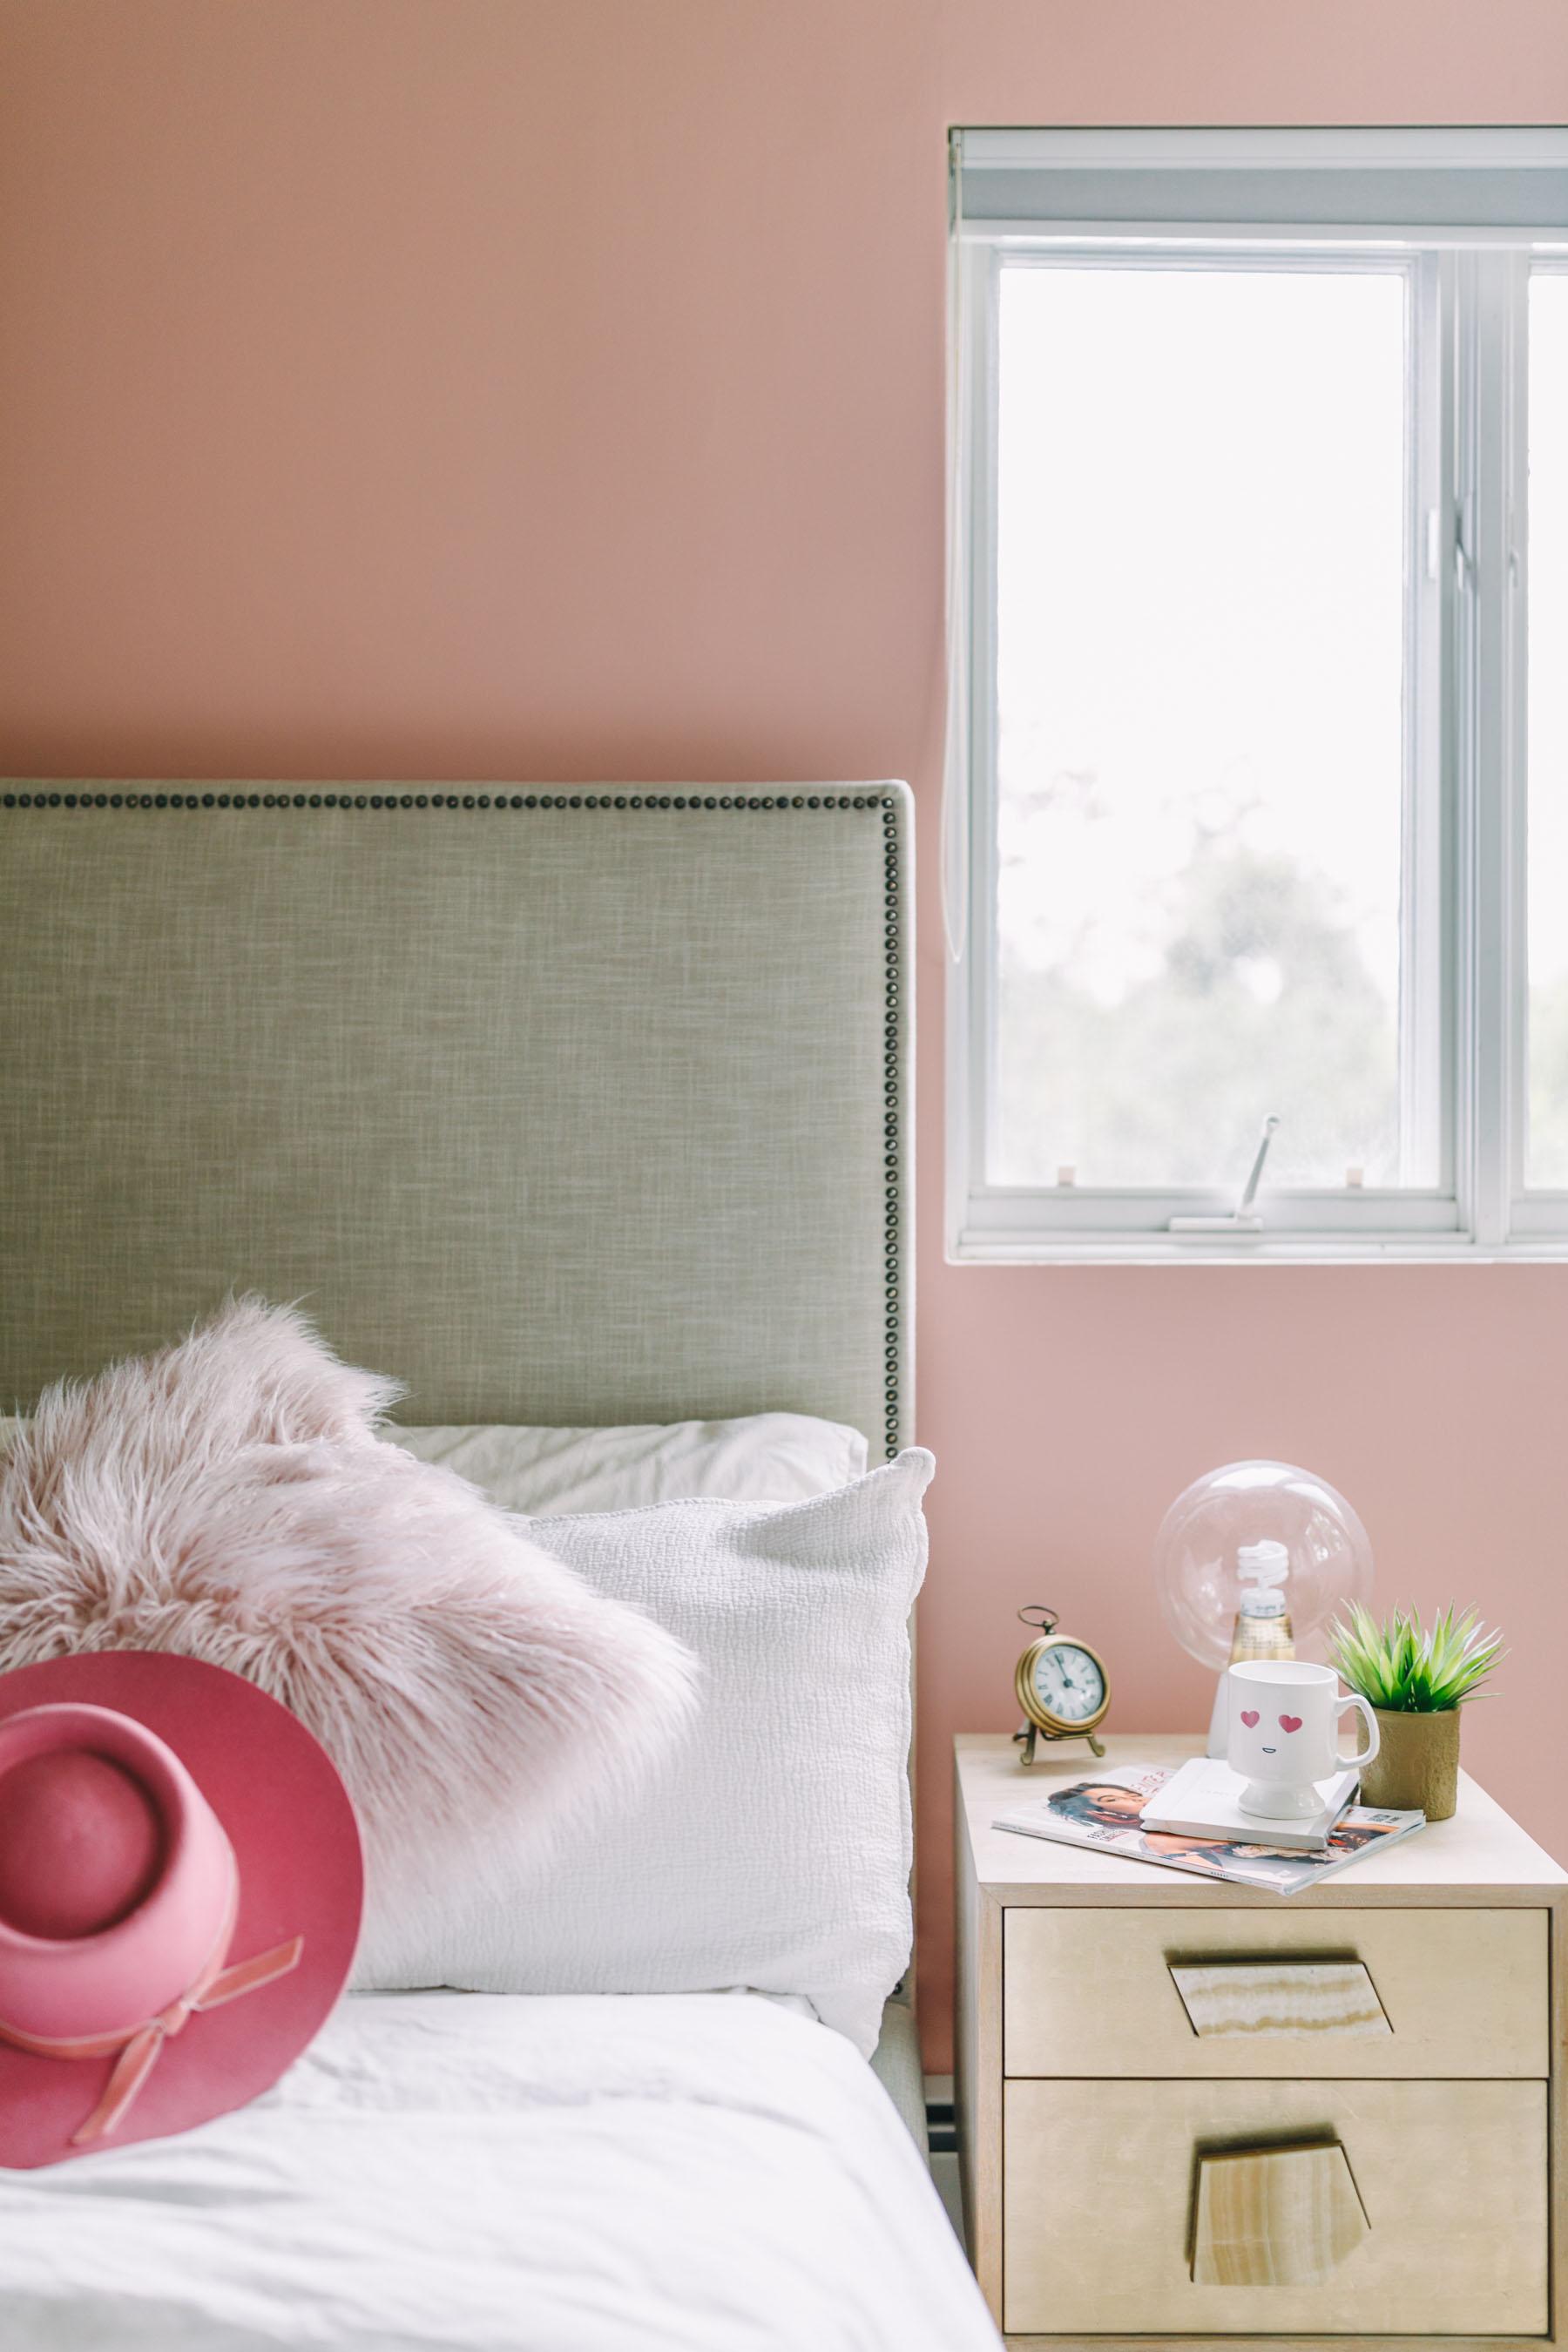 behr premium plus ultra paint x notjessfashion 009 1. Black Bedroom Furniture Sets. Home Design Ideas